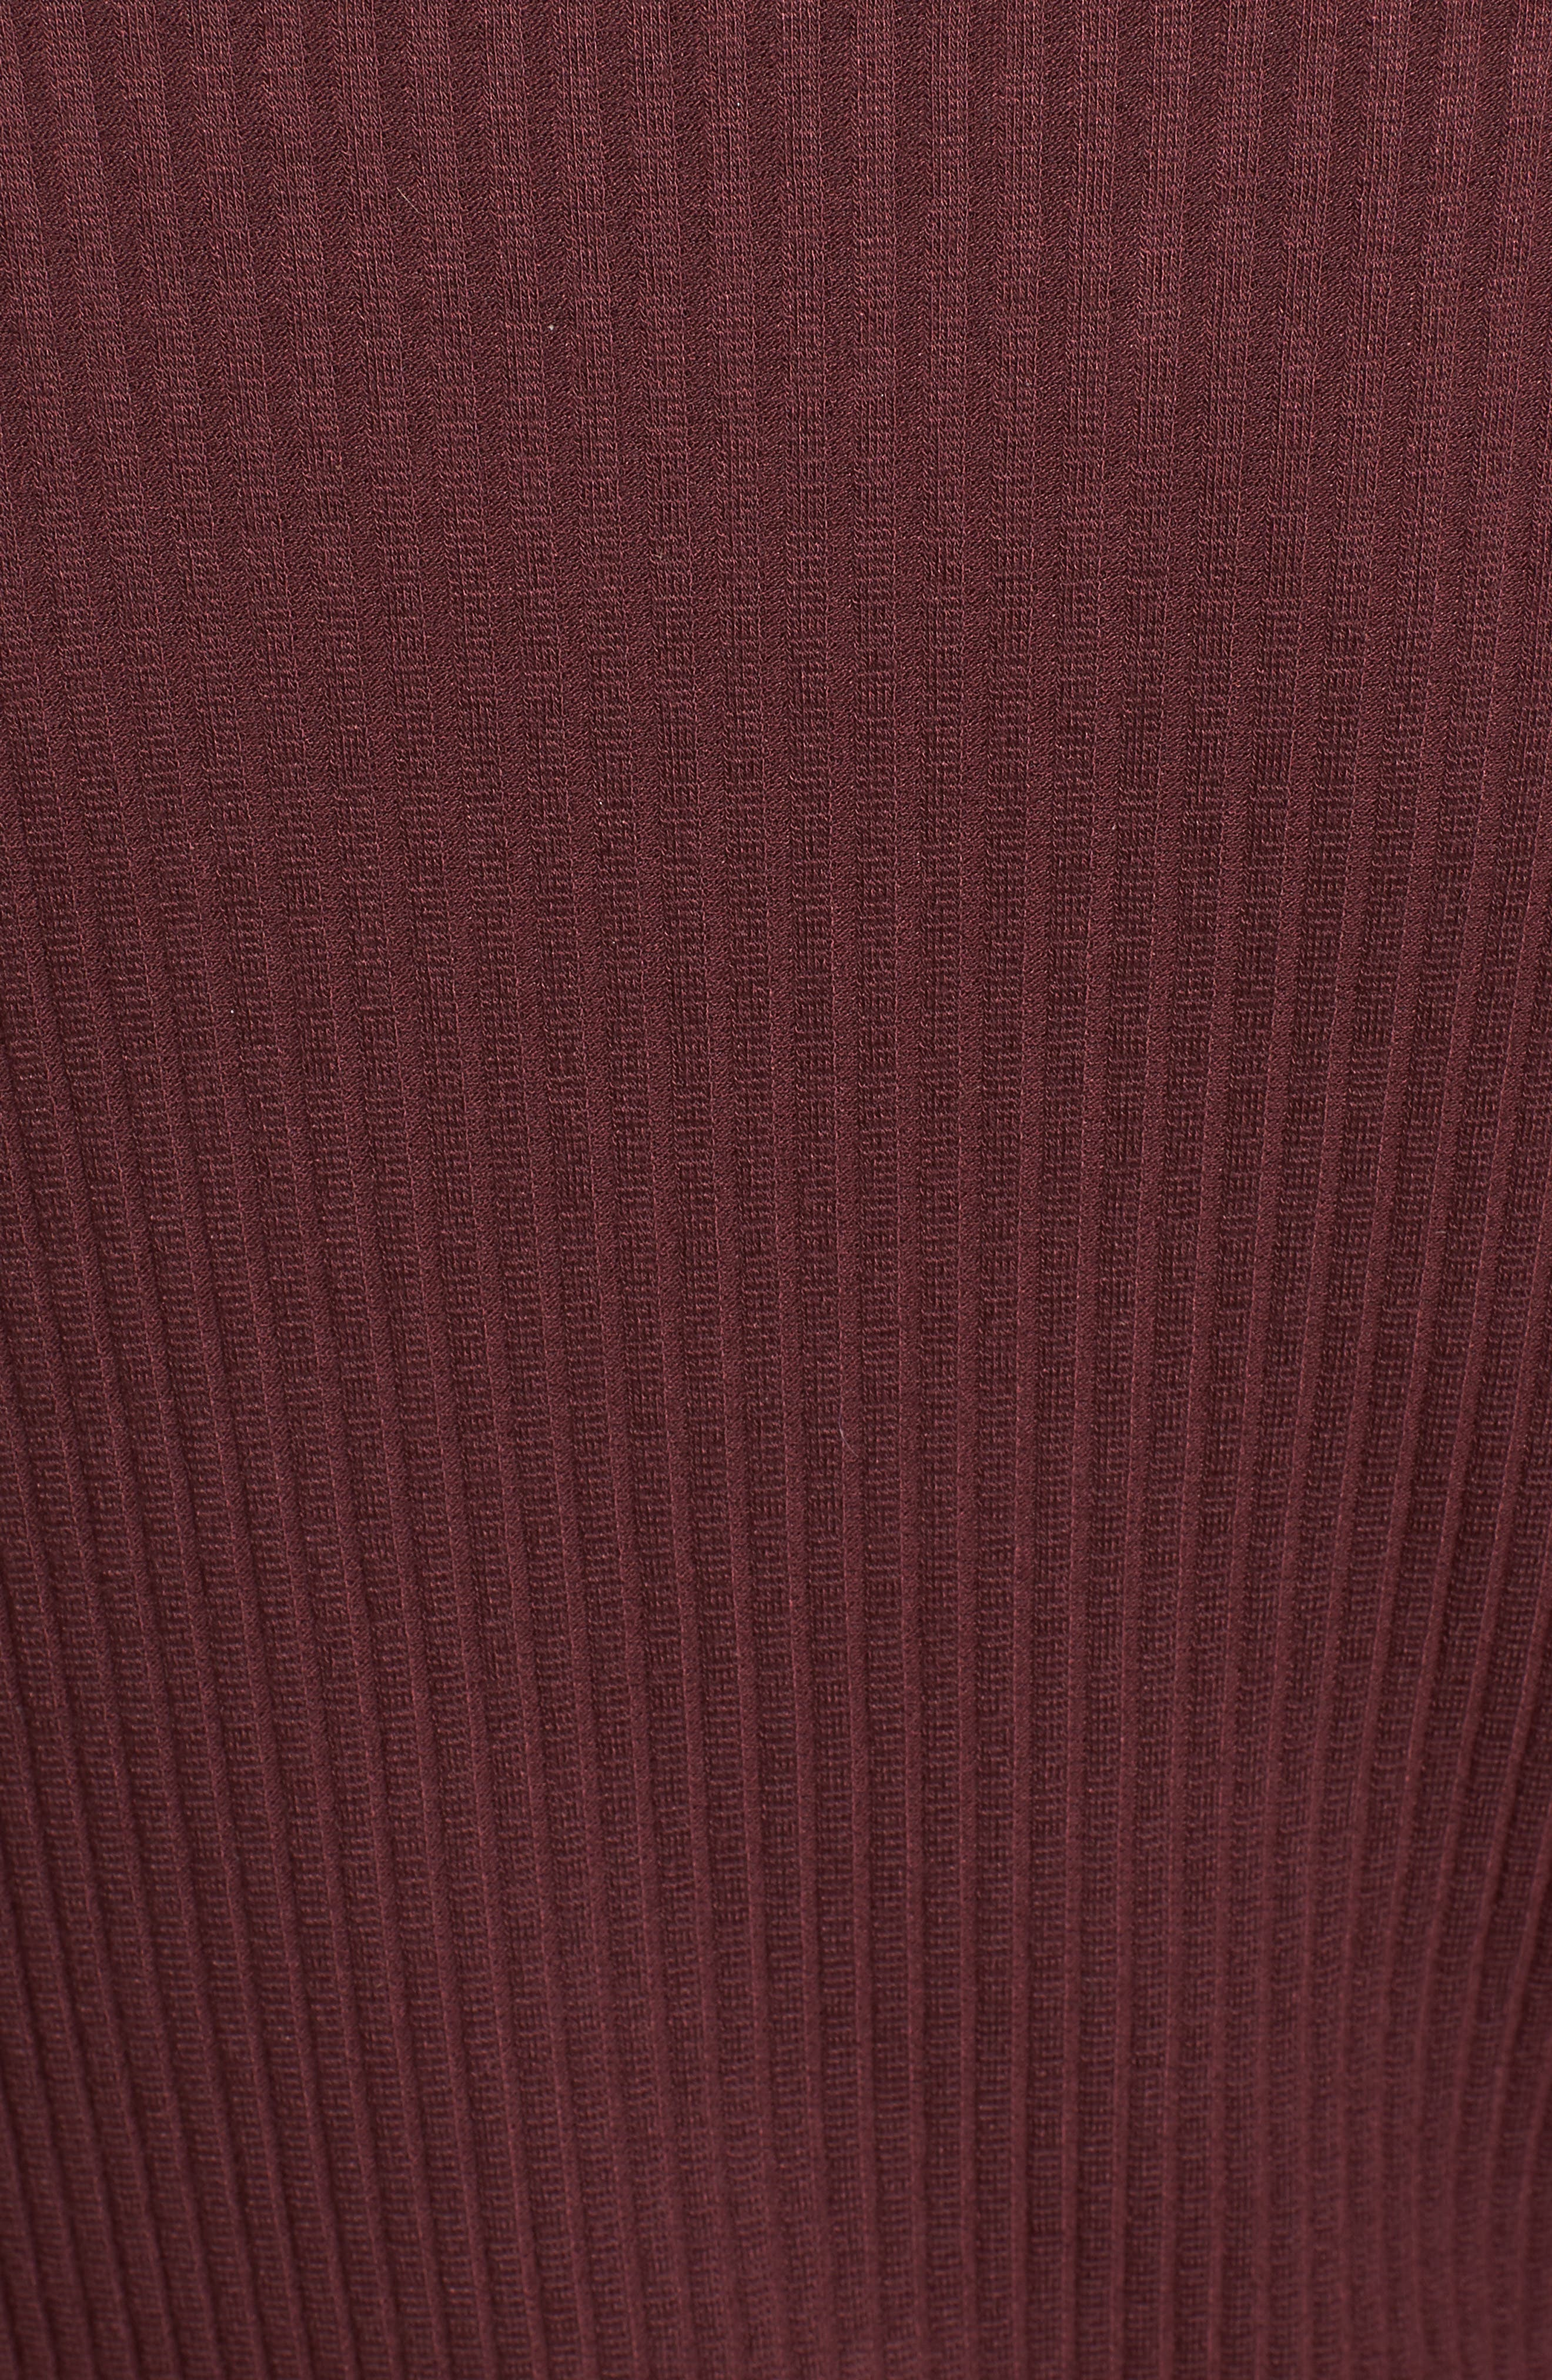 Step Hem Turtleneck Dress,                             Alternate thumbnail 5, color,                             931